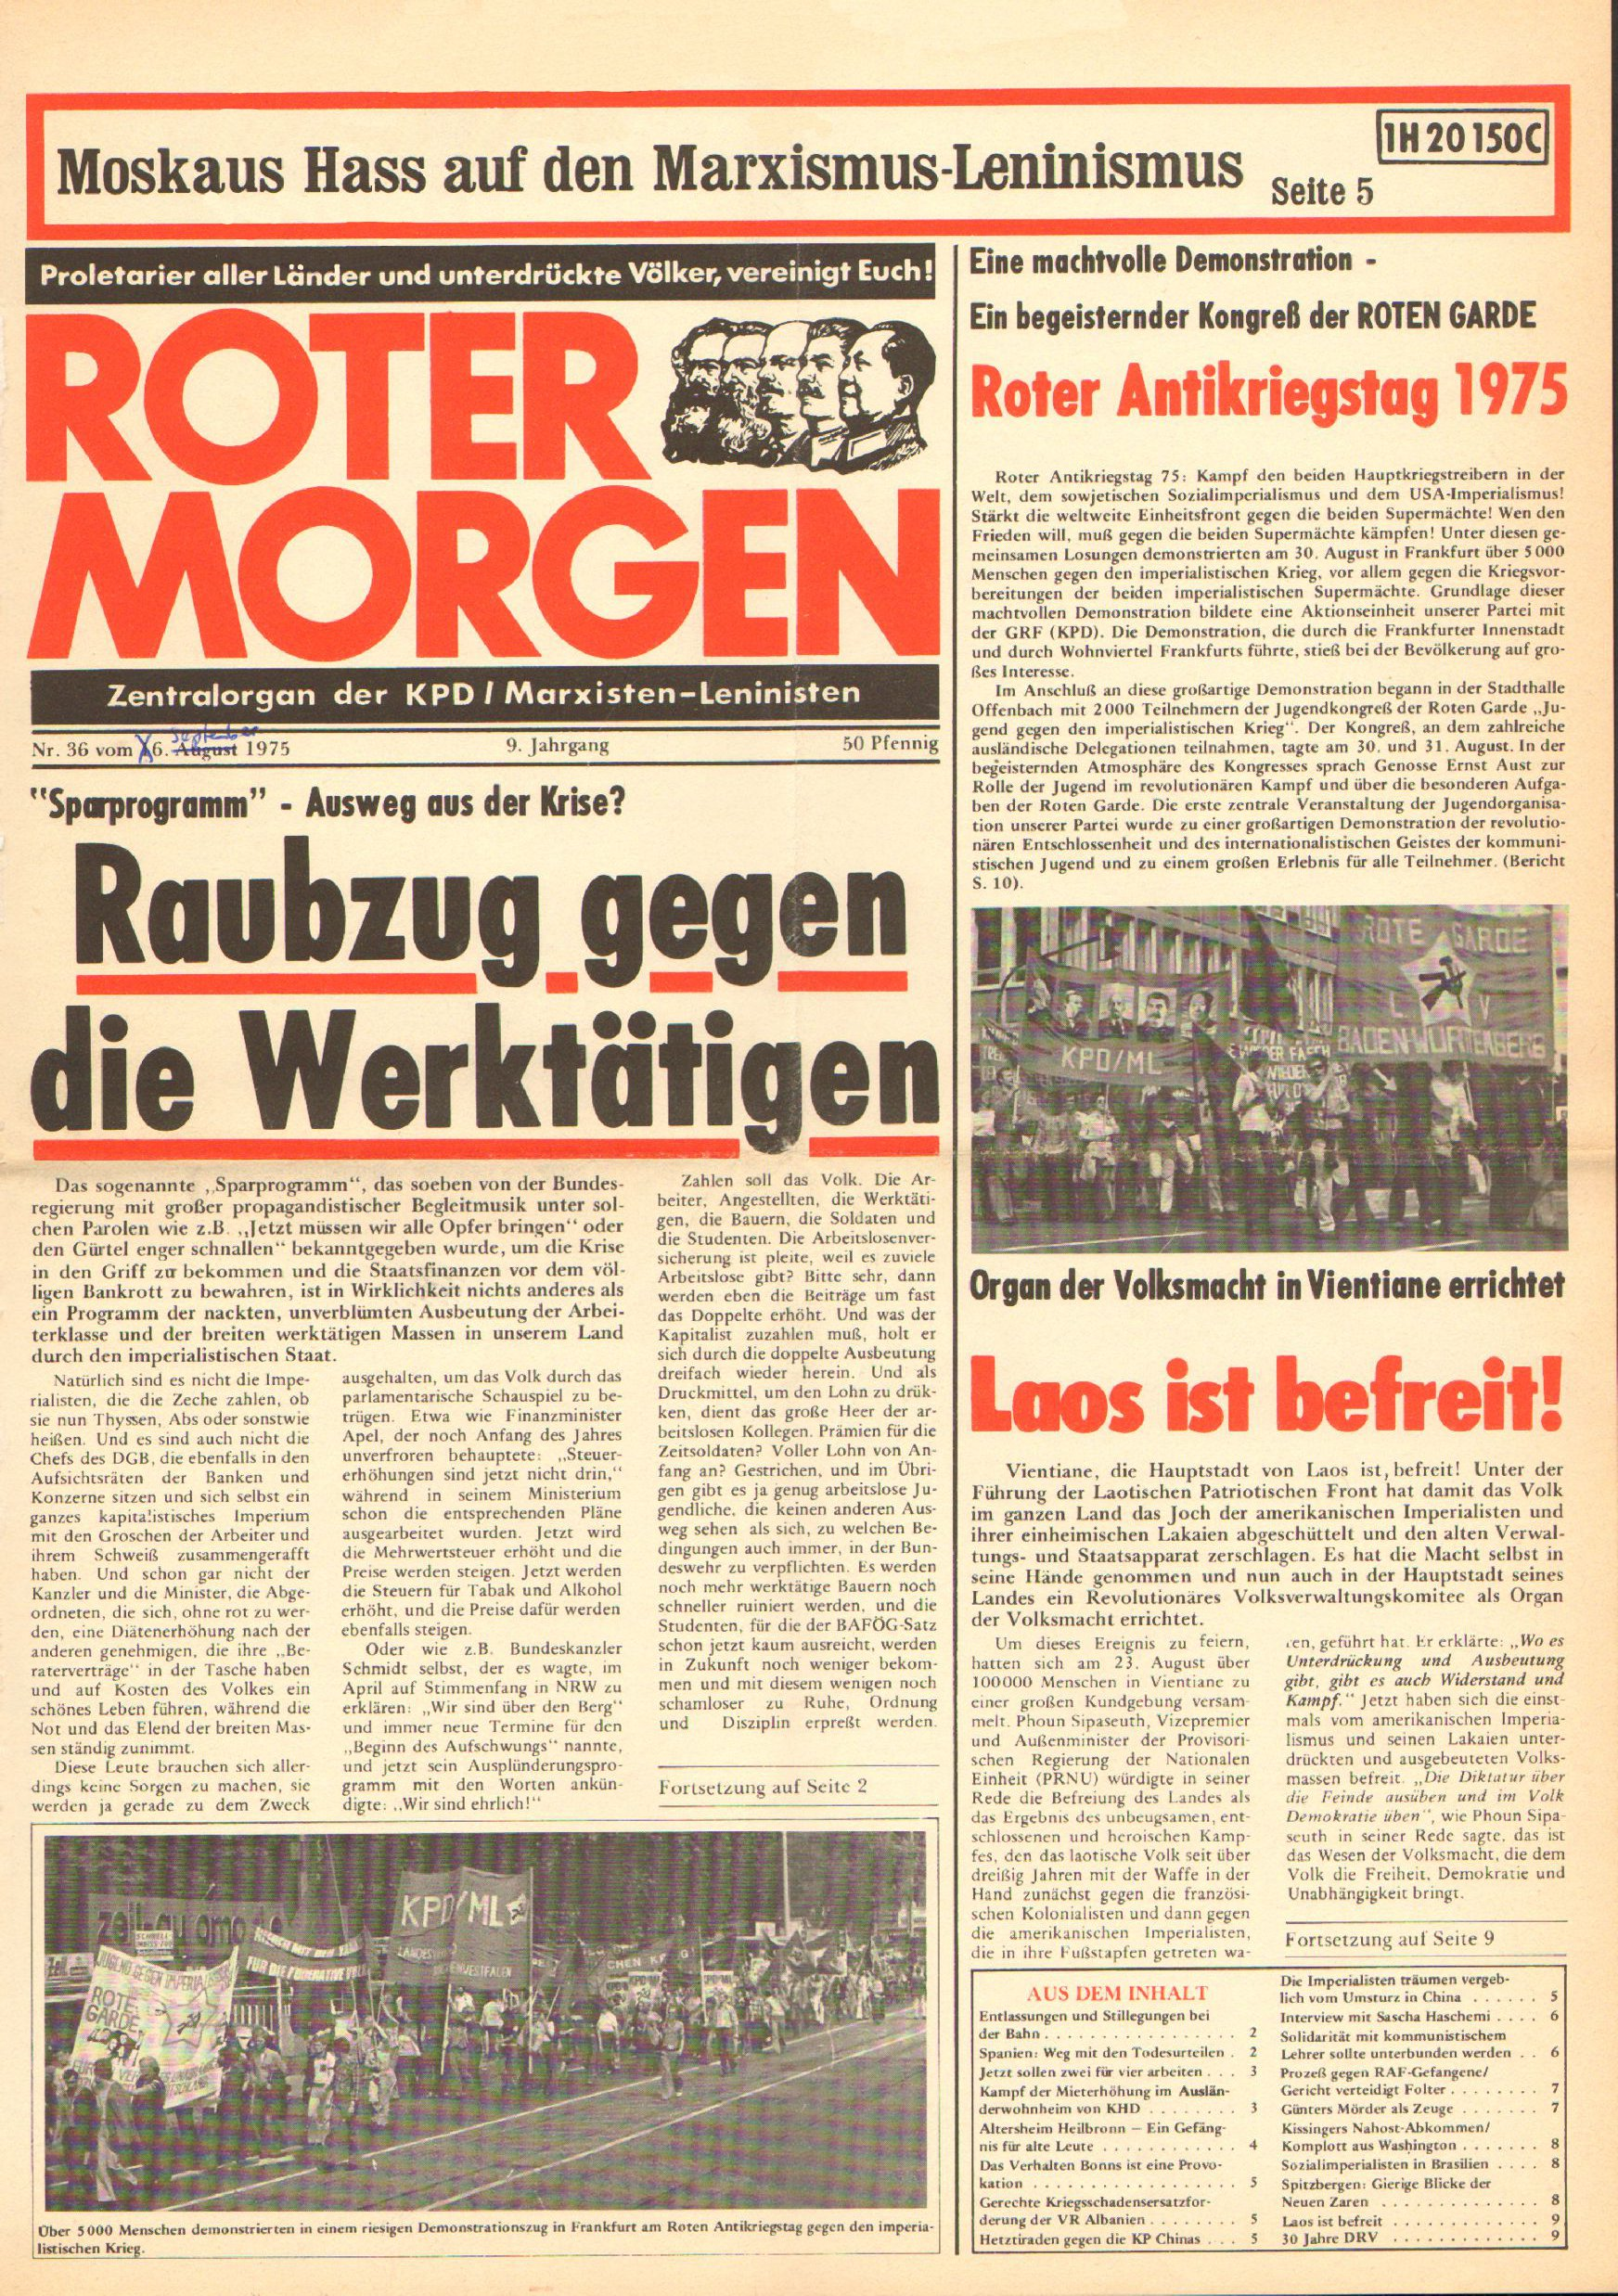 Roter Morgen, 9. Jg., 6. September 1975, Nr. 36, Seite 1